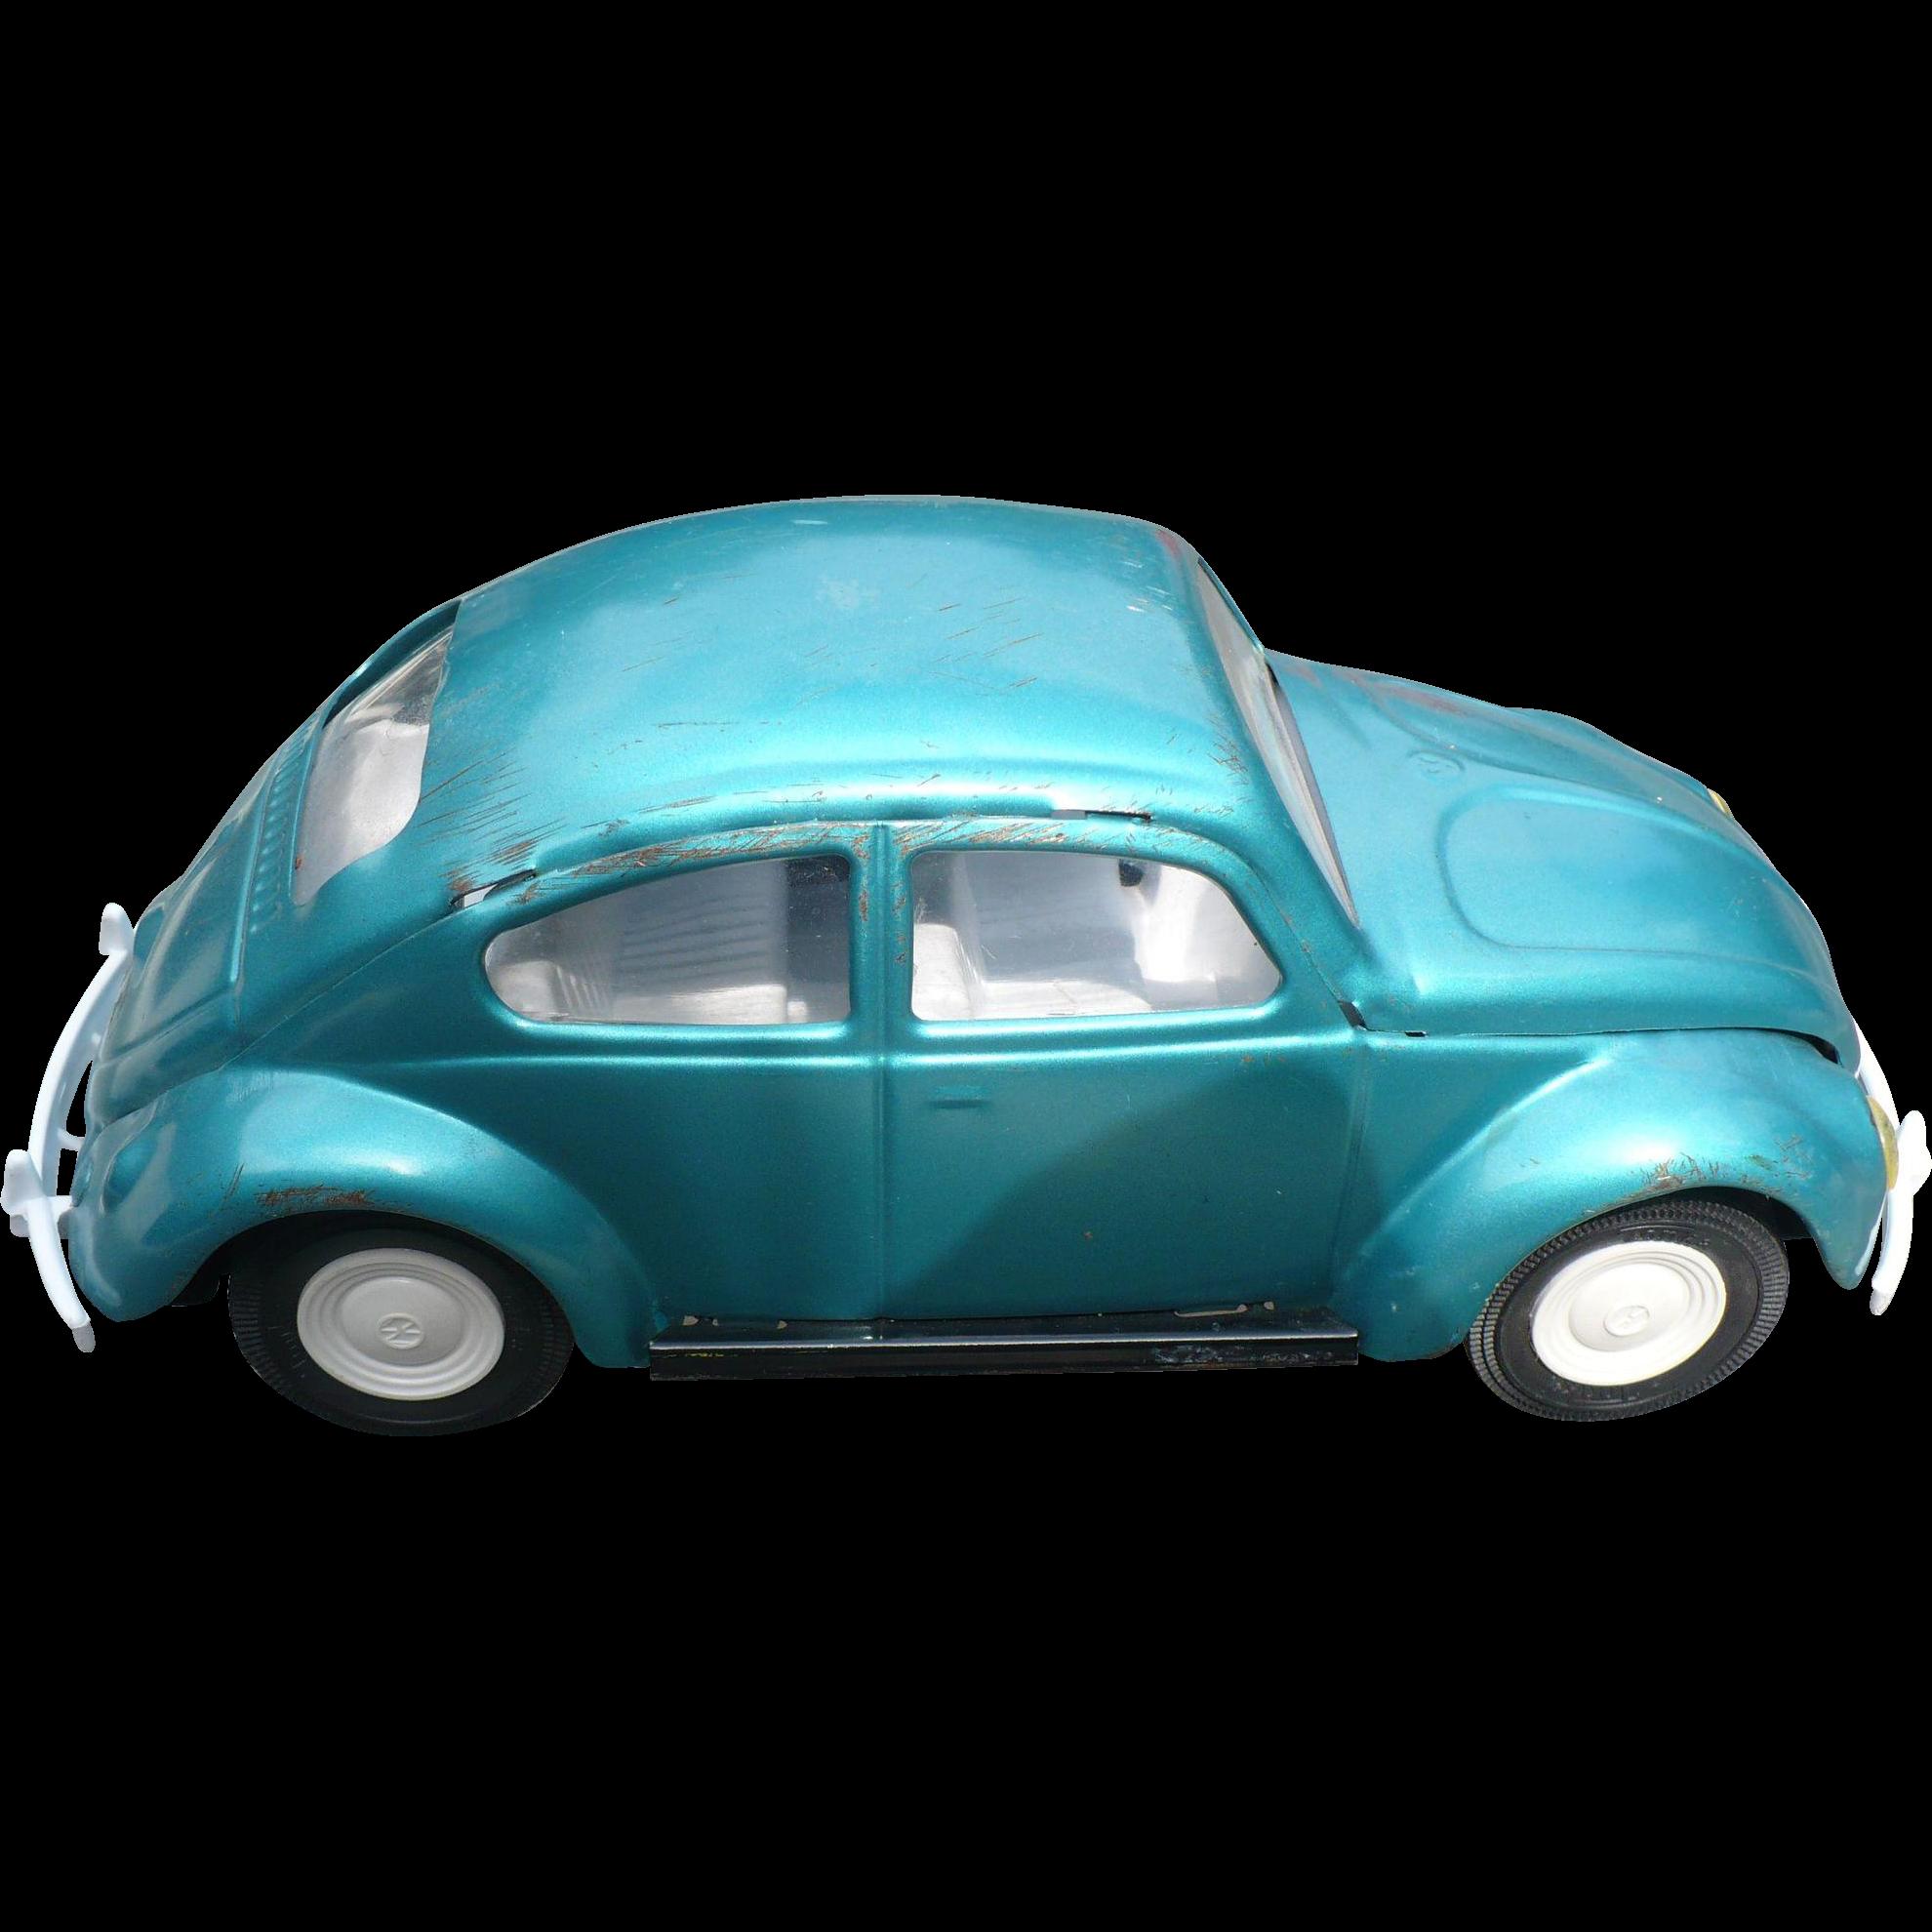 photos s volkswagen photo price sedan features jetta naperville reviews